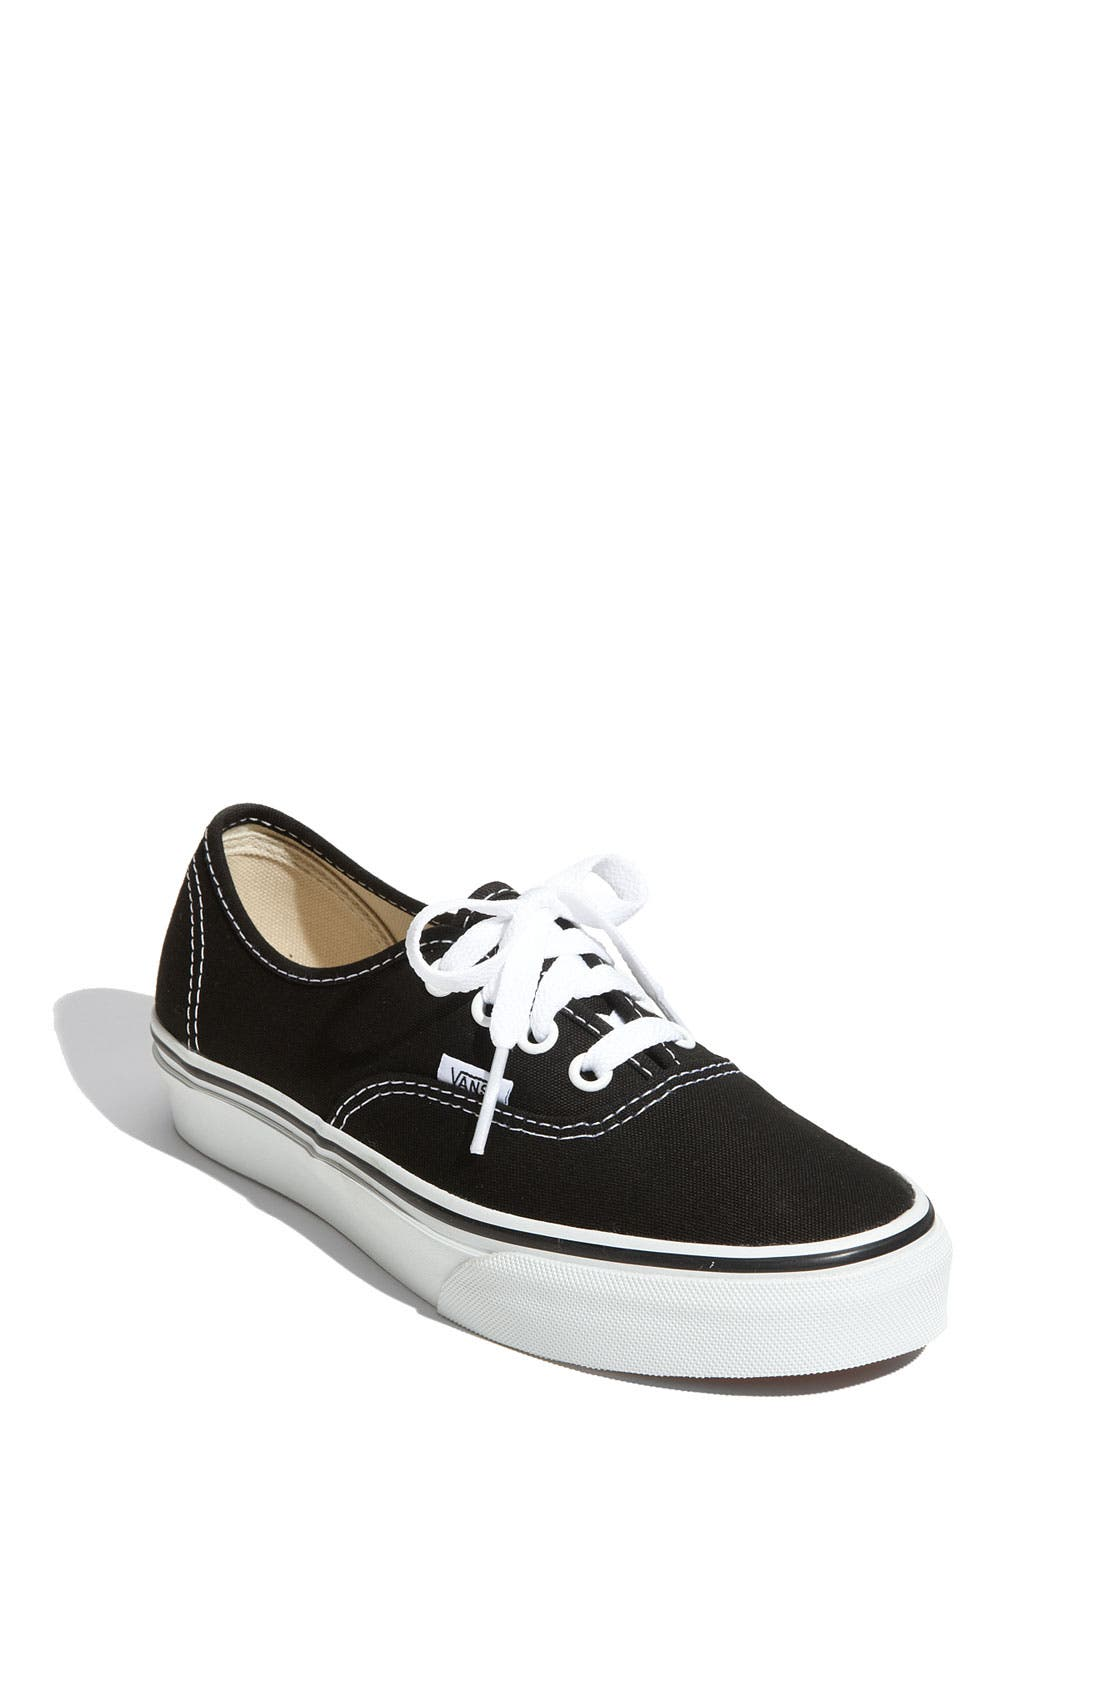 Main Image - Vans 'Authentic' Sneaker (Toddler, Little Kid & Big Kid)